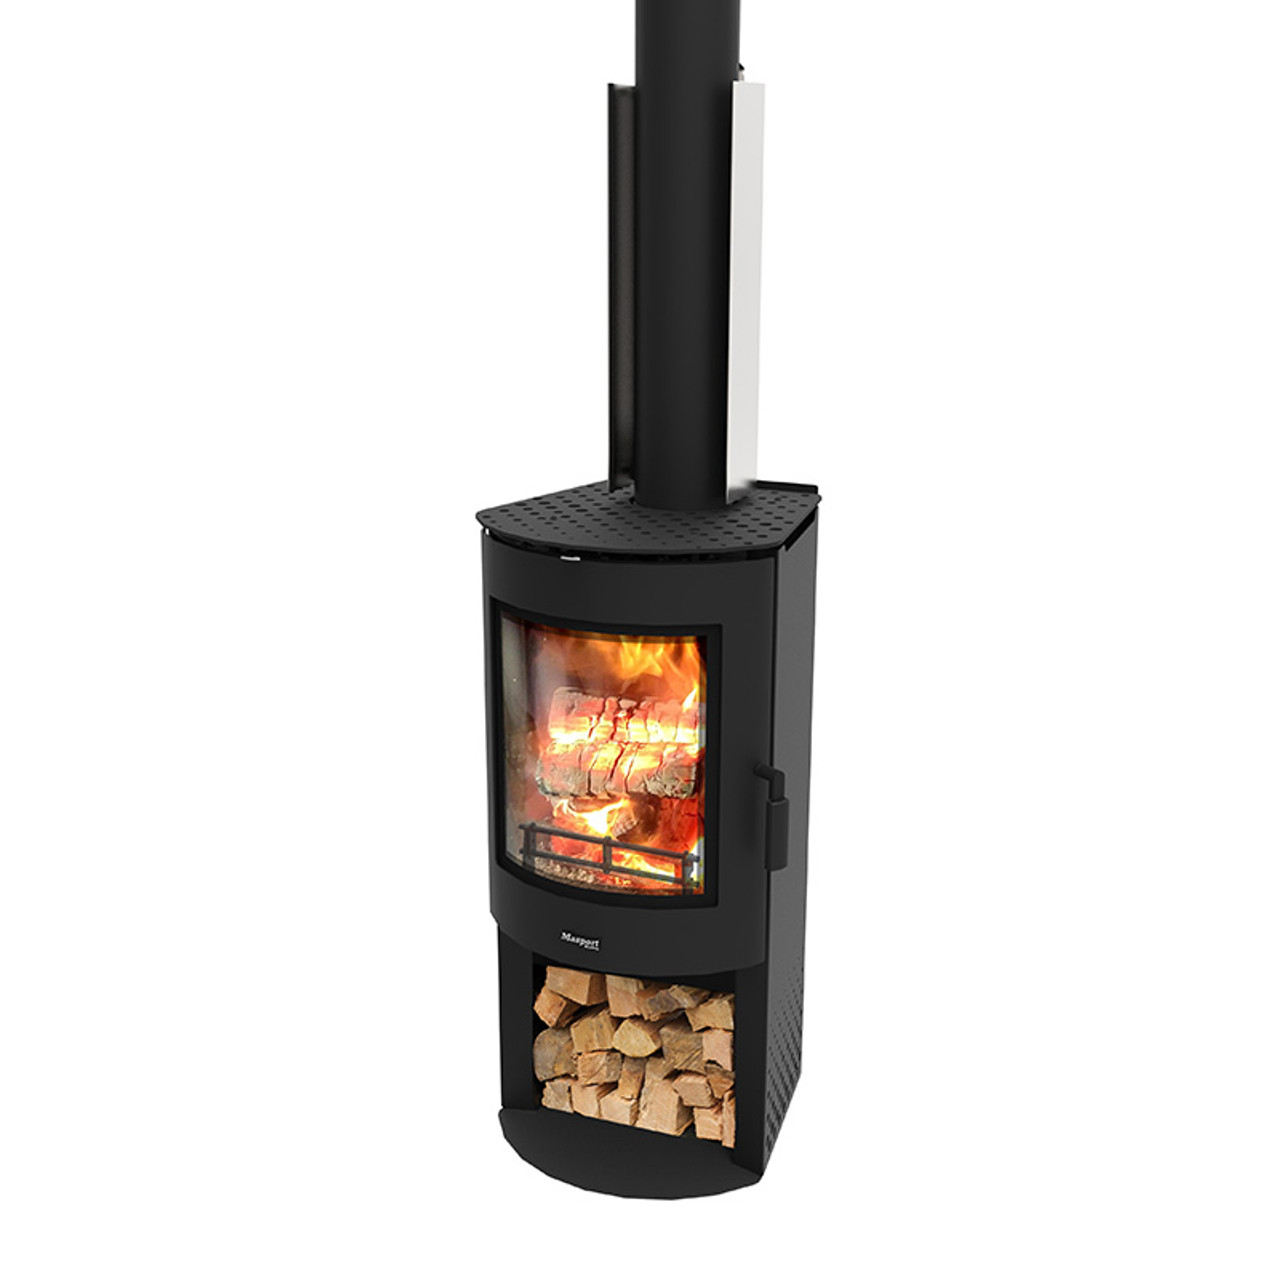 AkaroaWS - Freestanding Radian Wood Burner With Wood Stacker